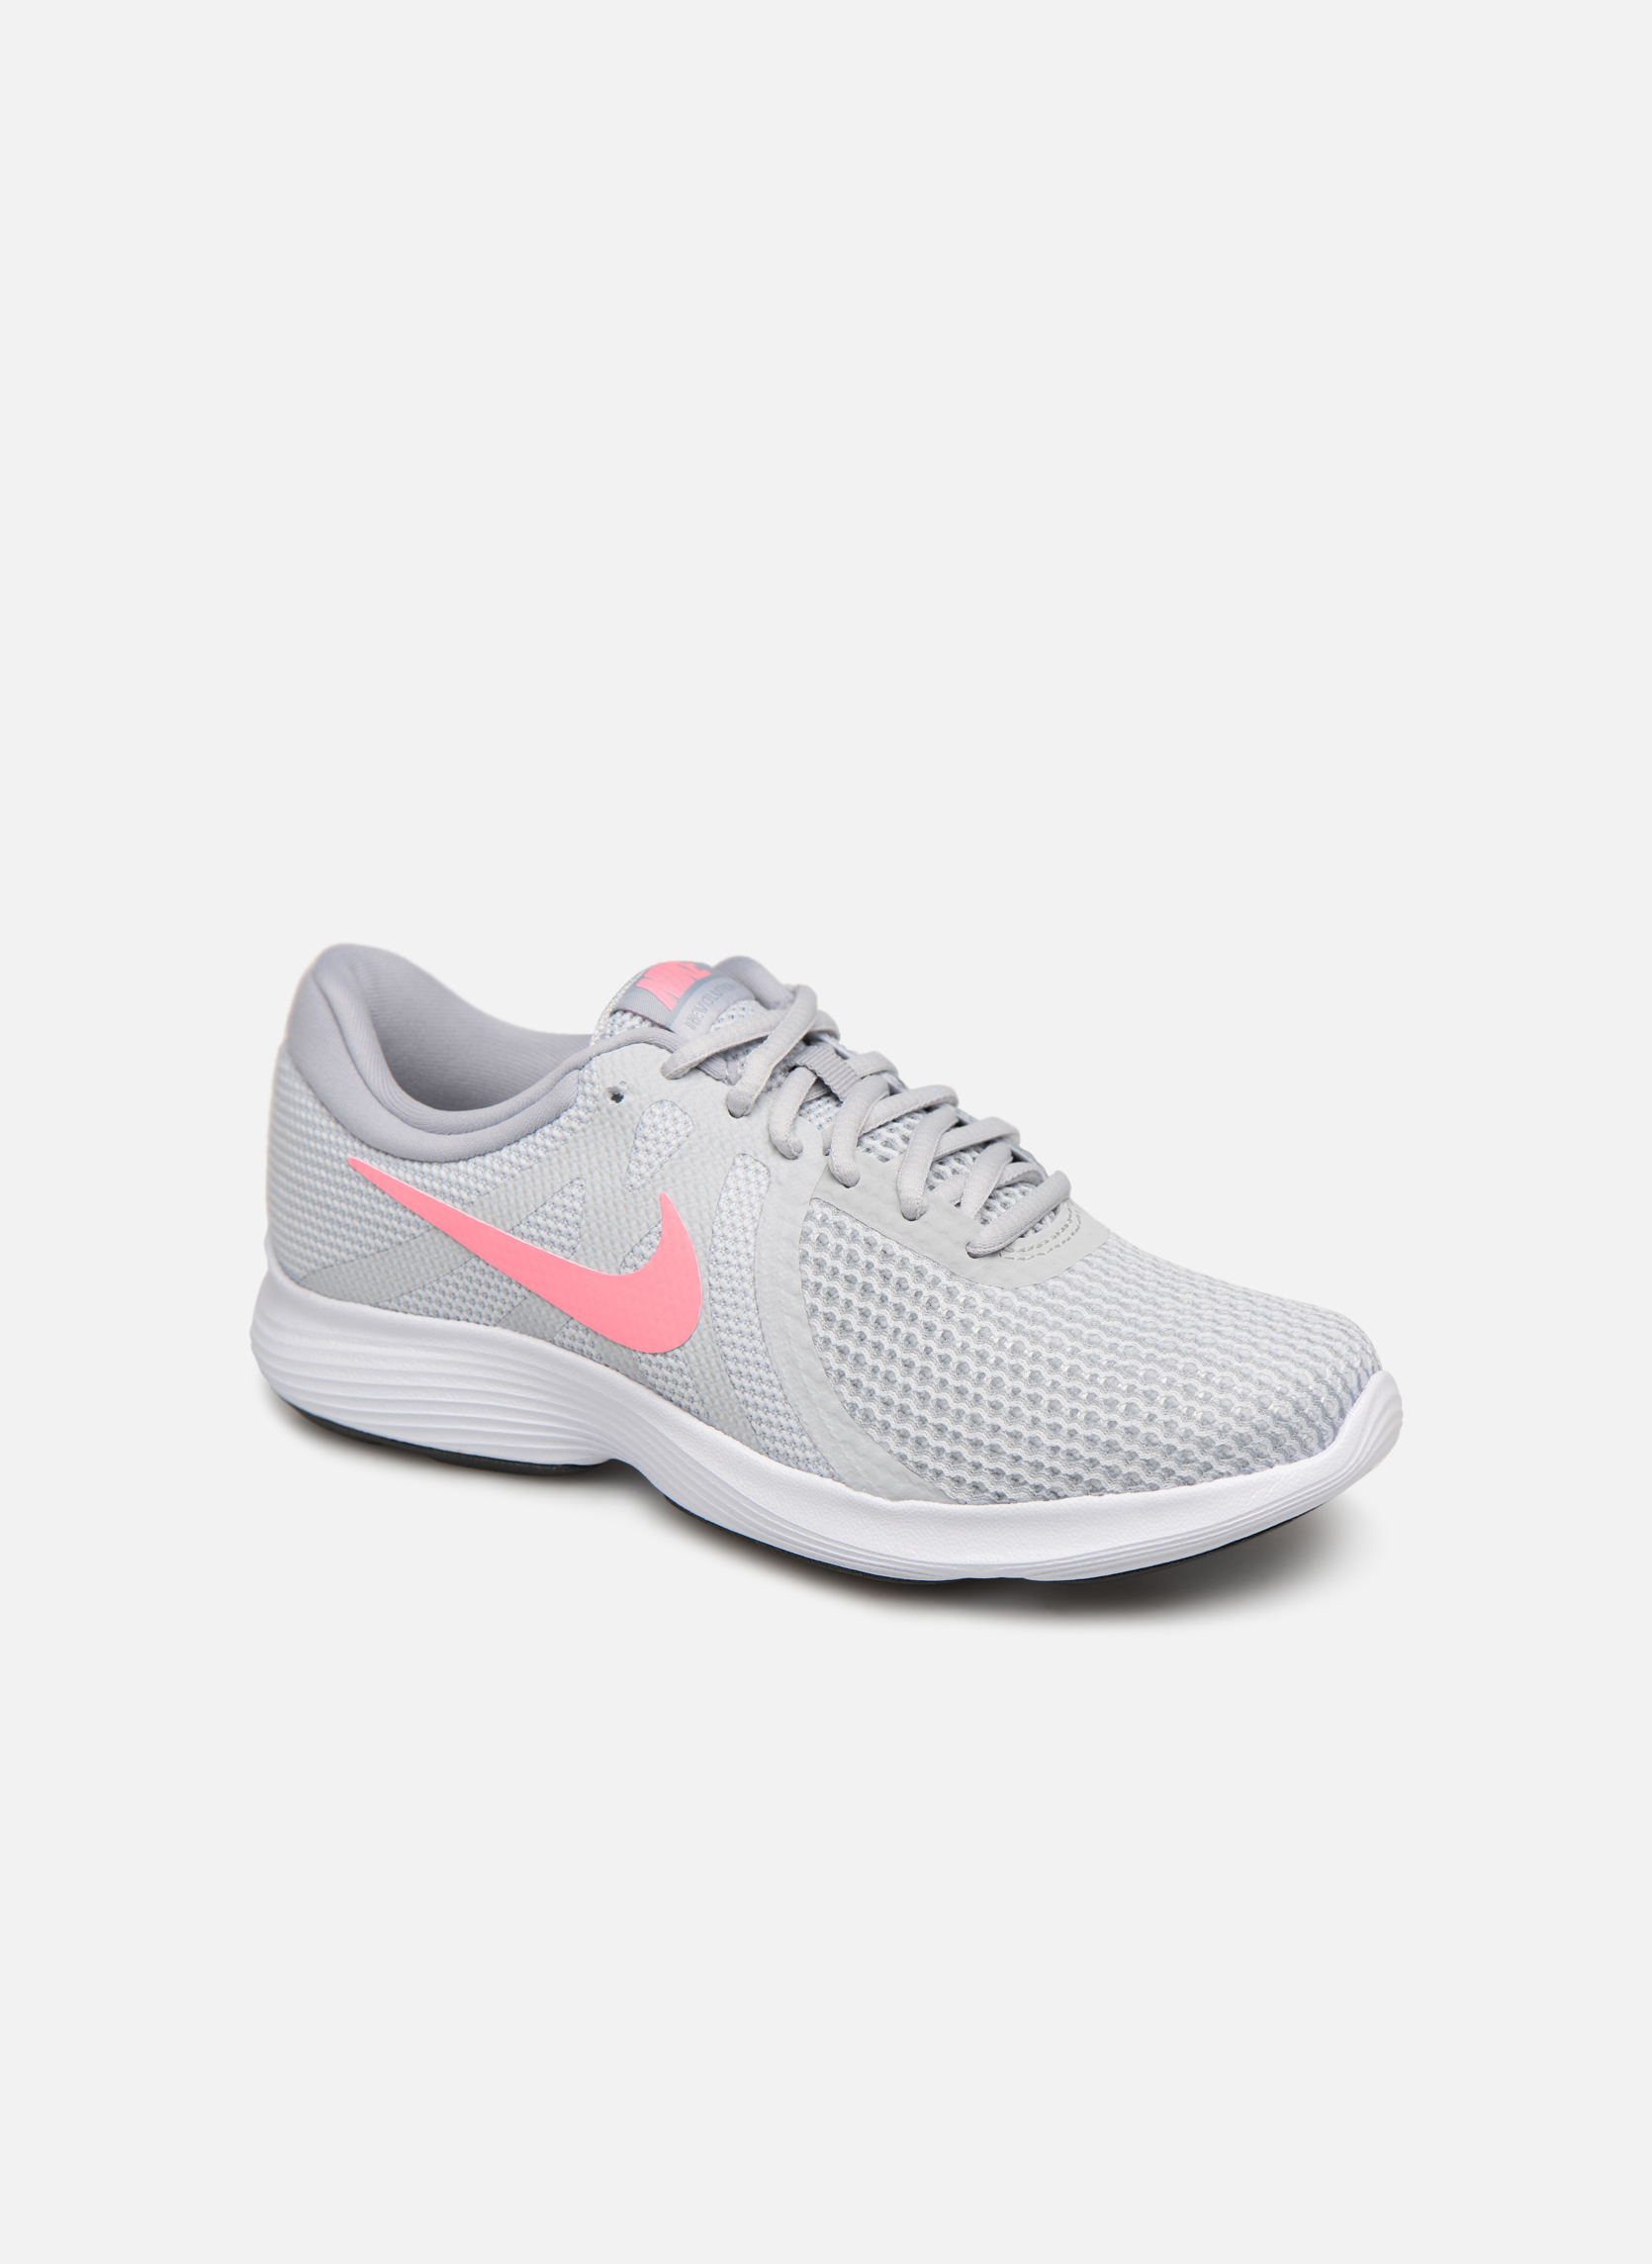 Bleu 3 Revolution Jaune 3 Nike Nike Revolution OXZPTiku